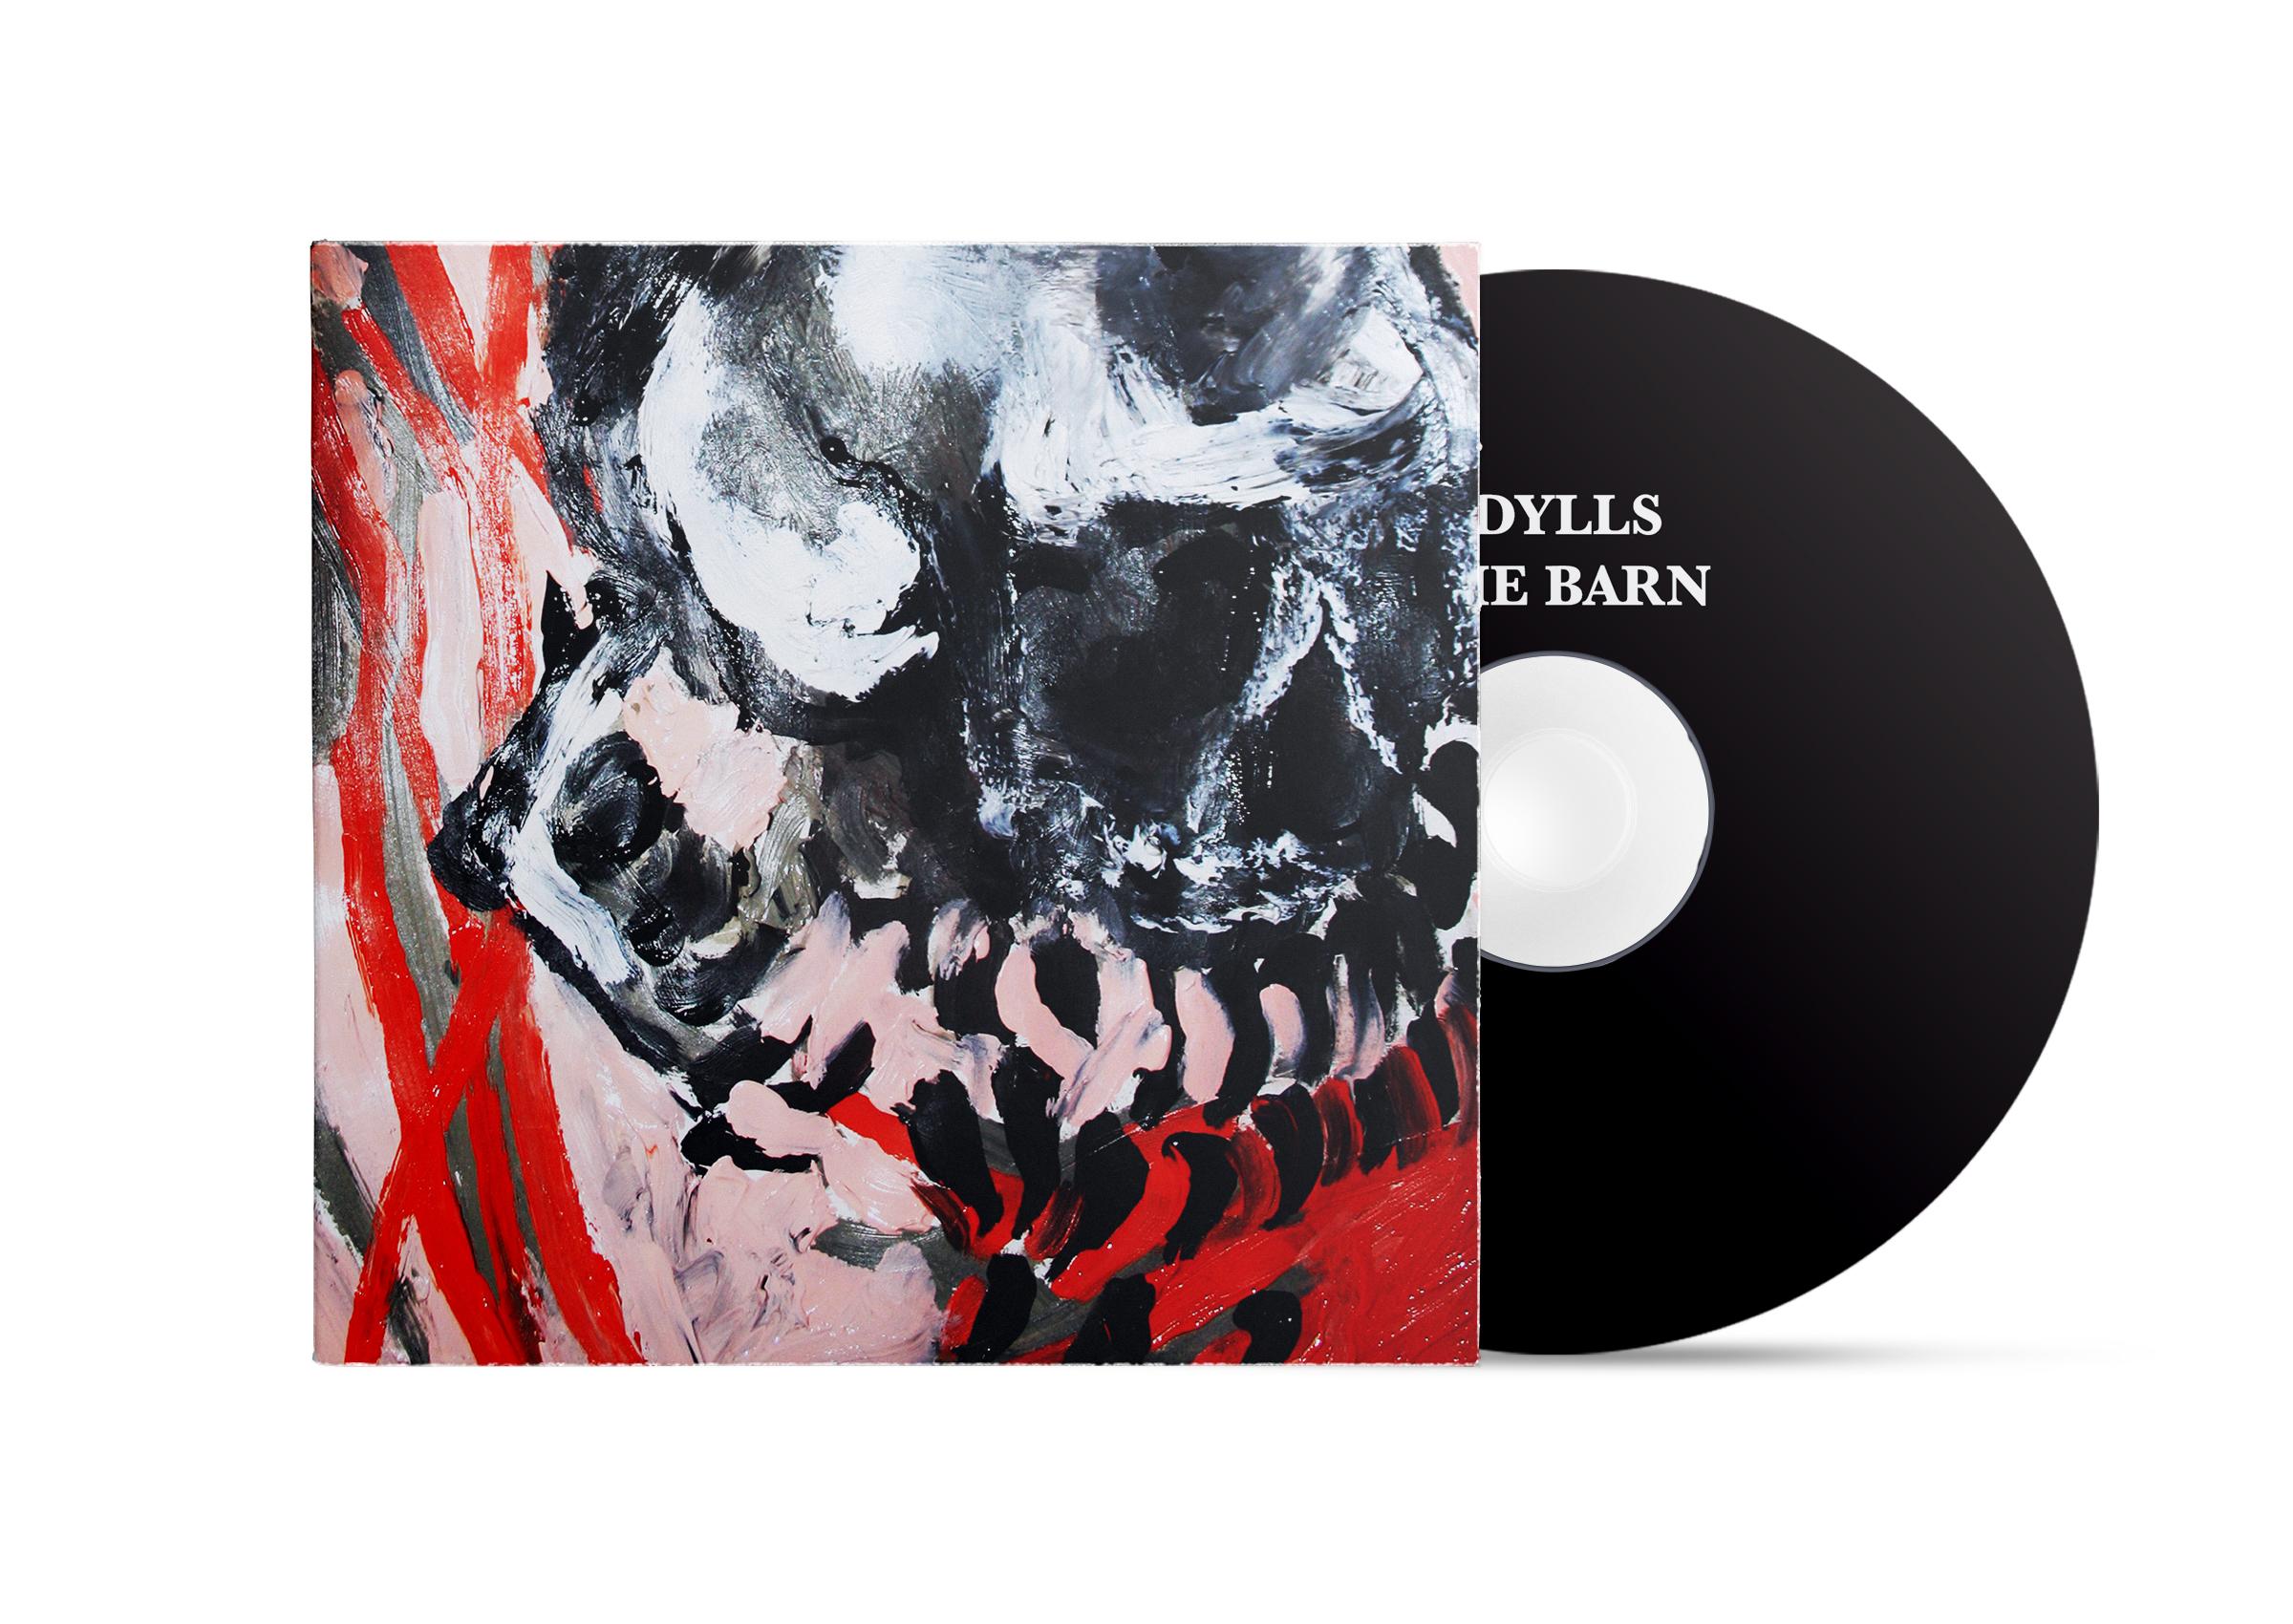 Idylls - The Barn